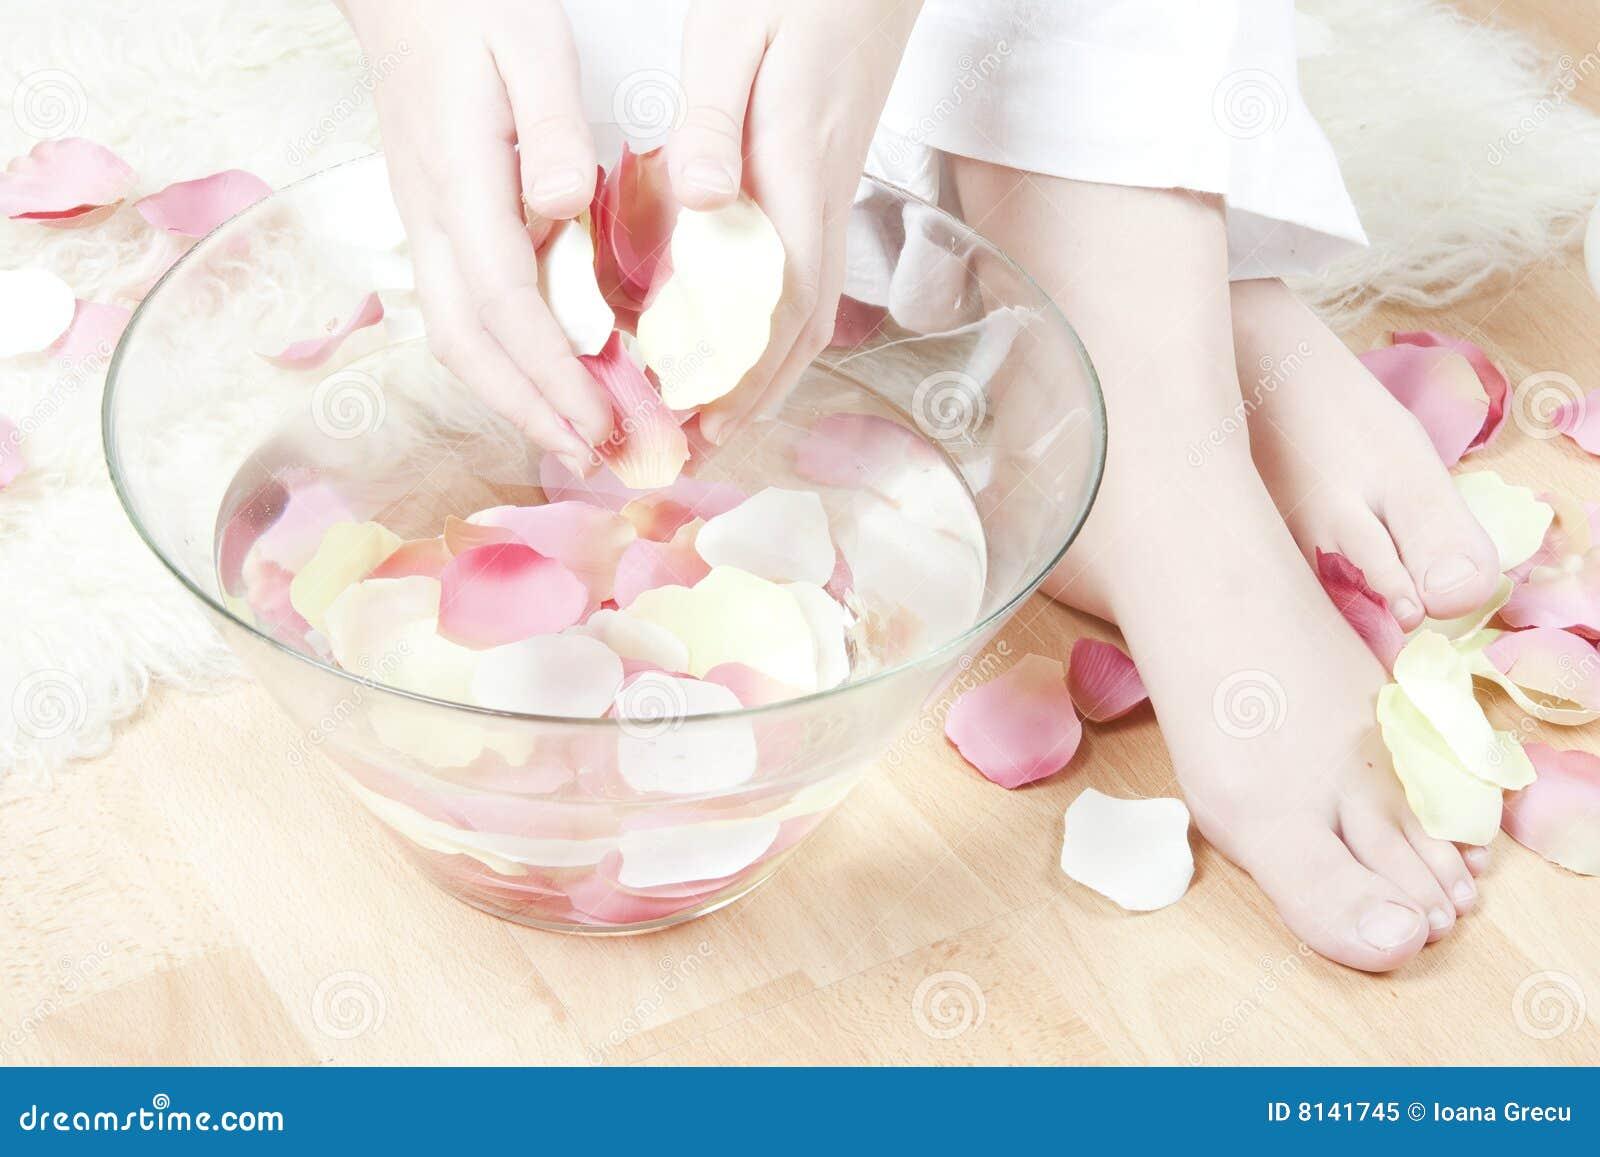 hand and feet spa